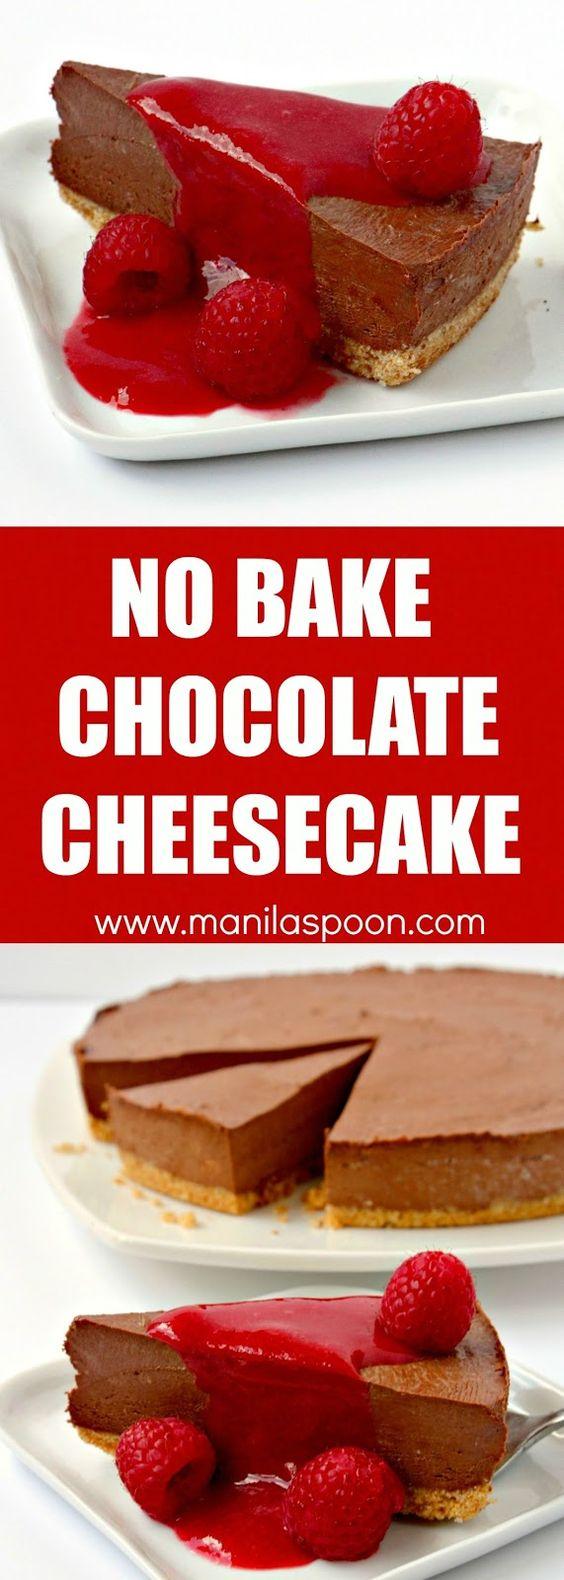 how to make dark chocolate into milk chocolate